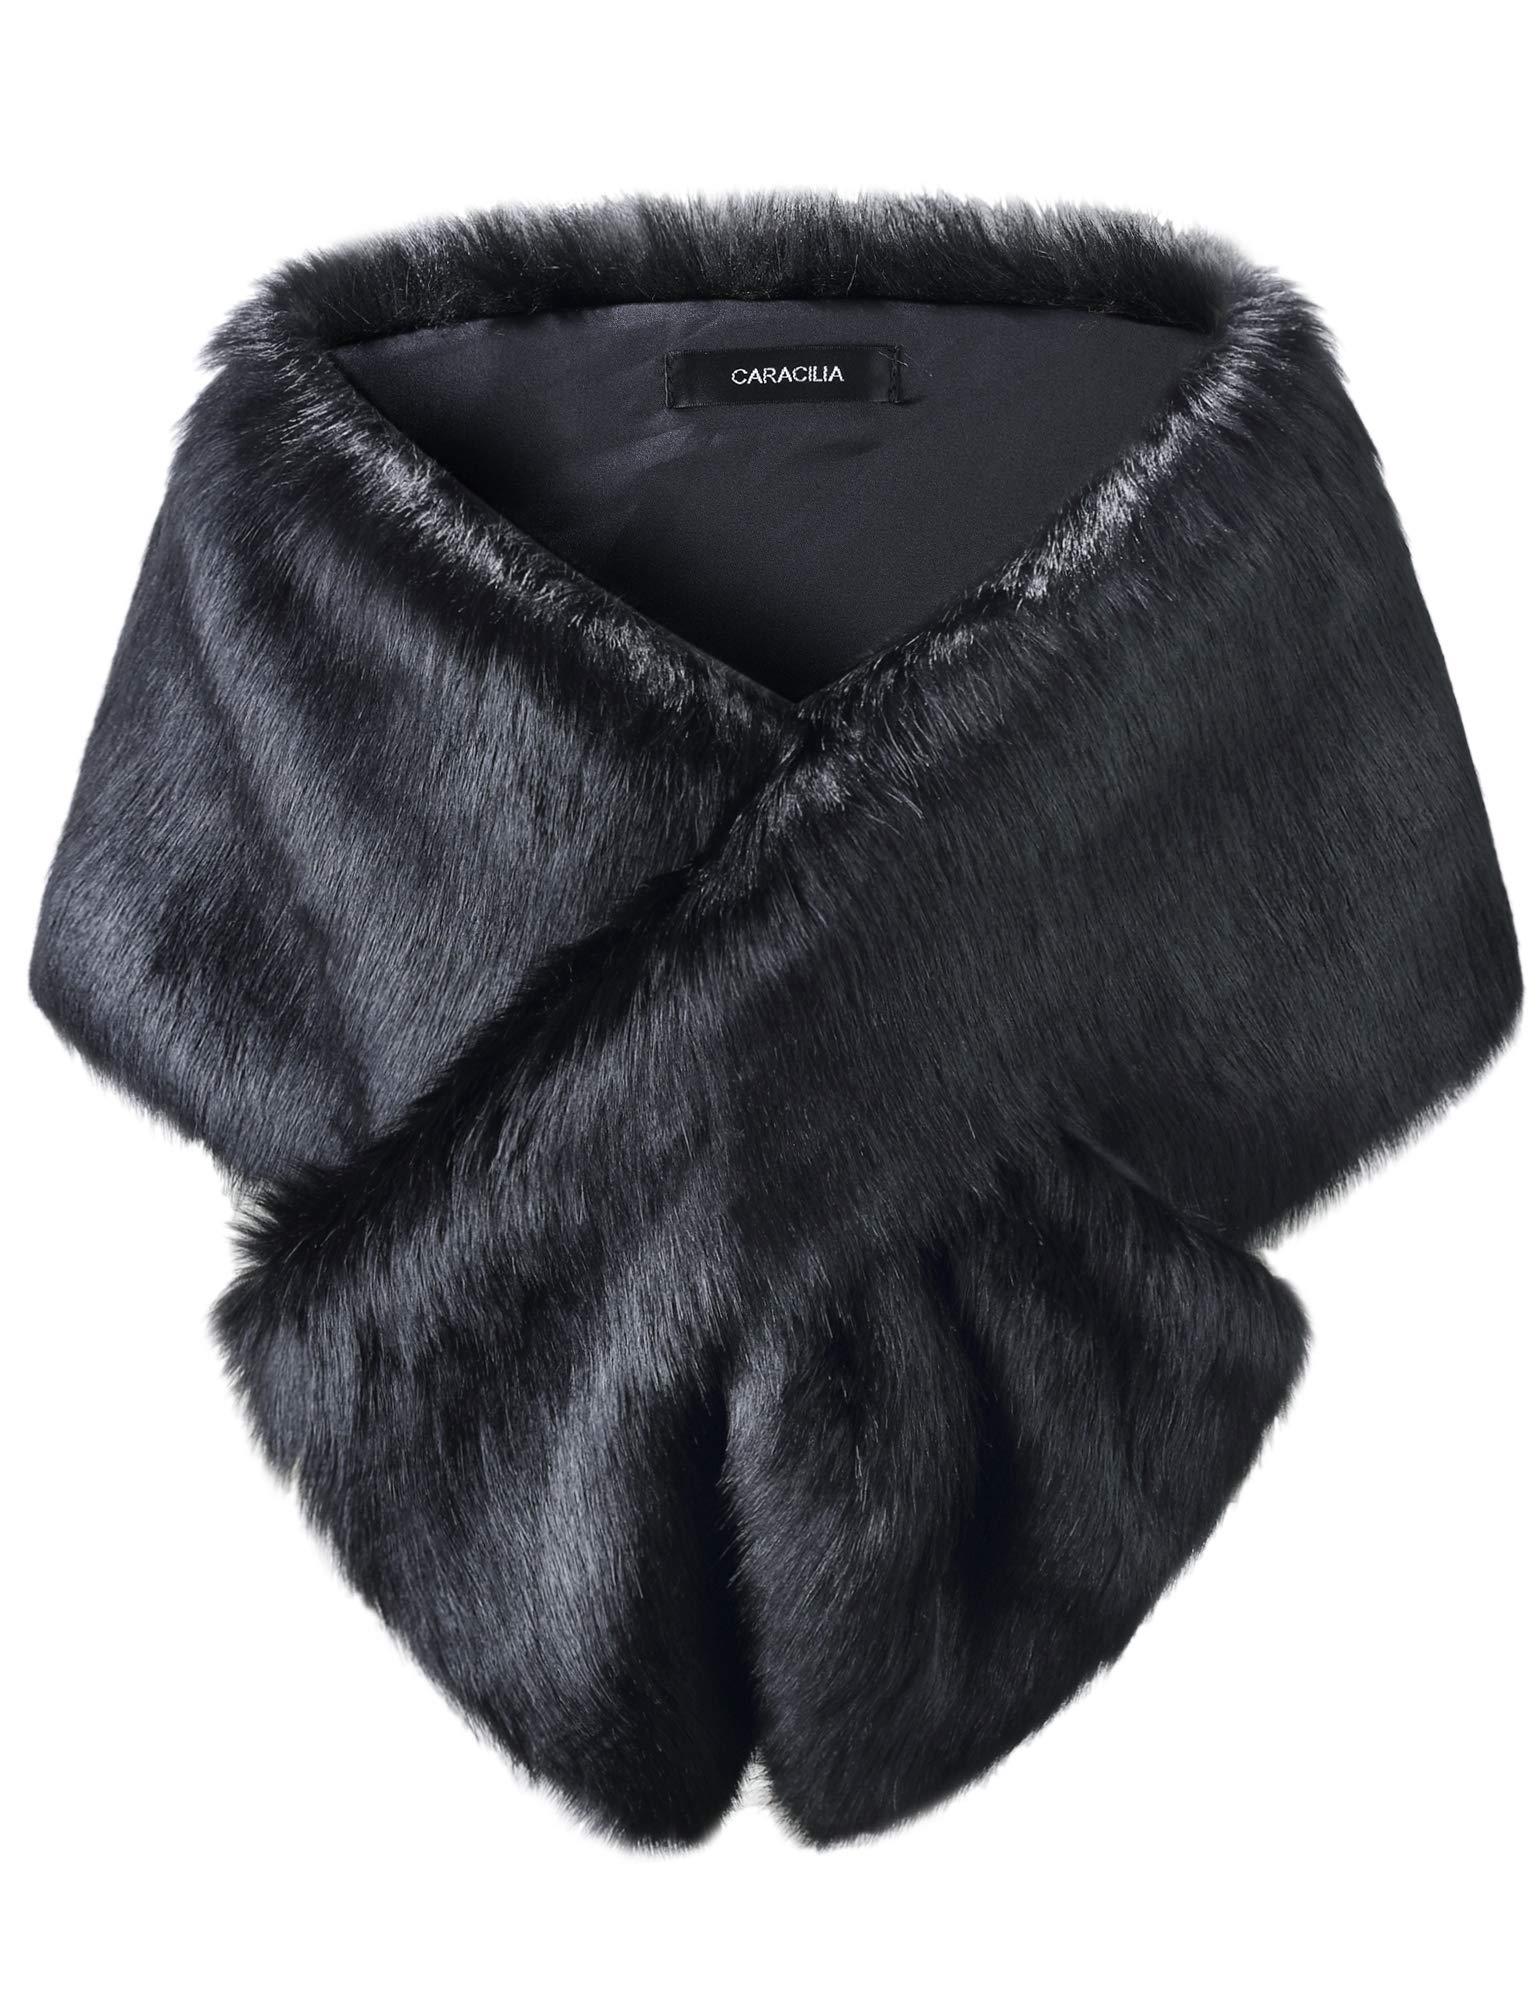 Caracilia Women's Faux Fur Shawl Wraps Cloak Coat Sweater Cape for Evening Party changmaohei2 L CAFB3 by Caracilia